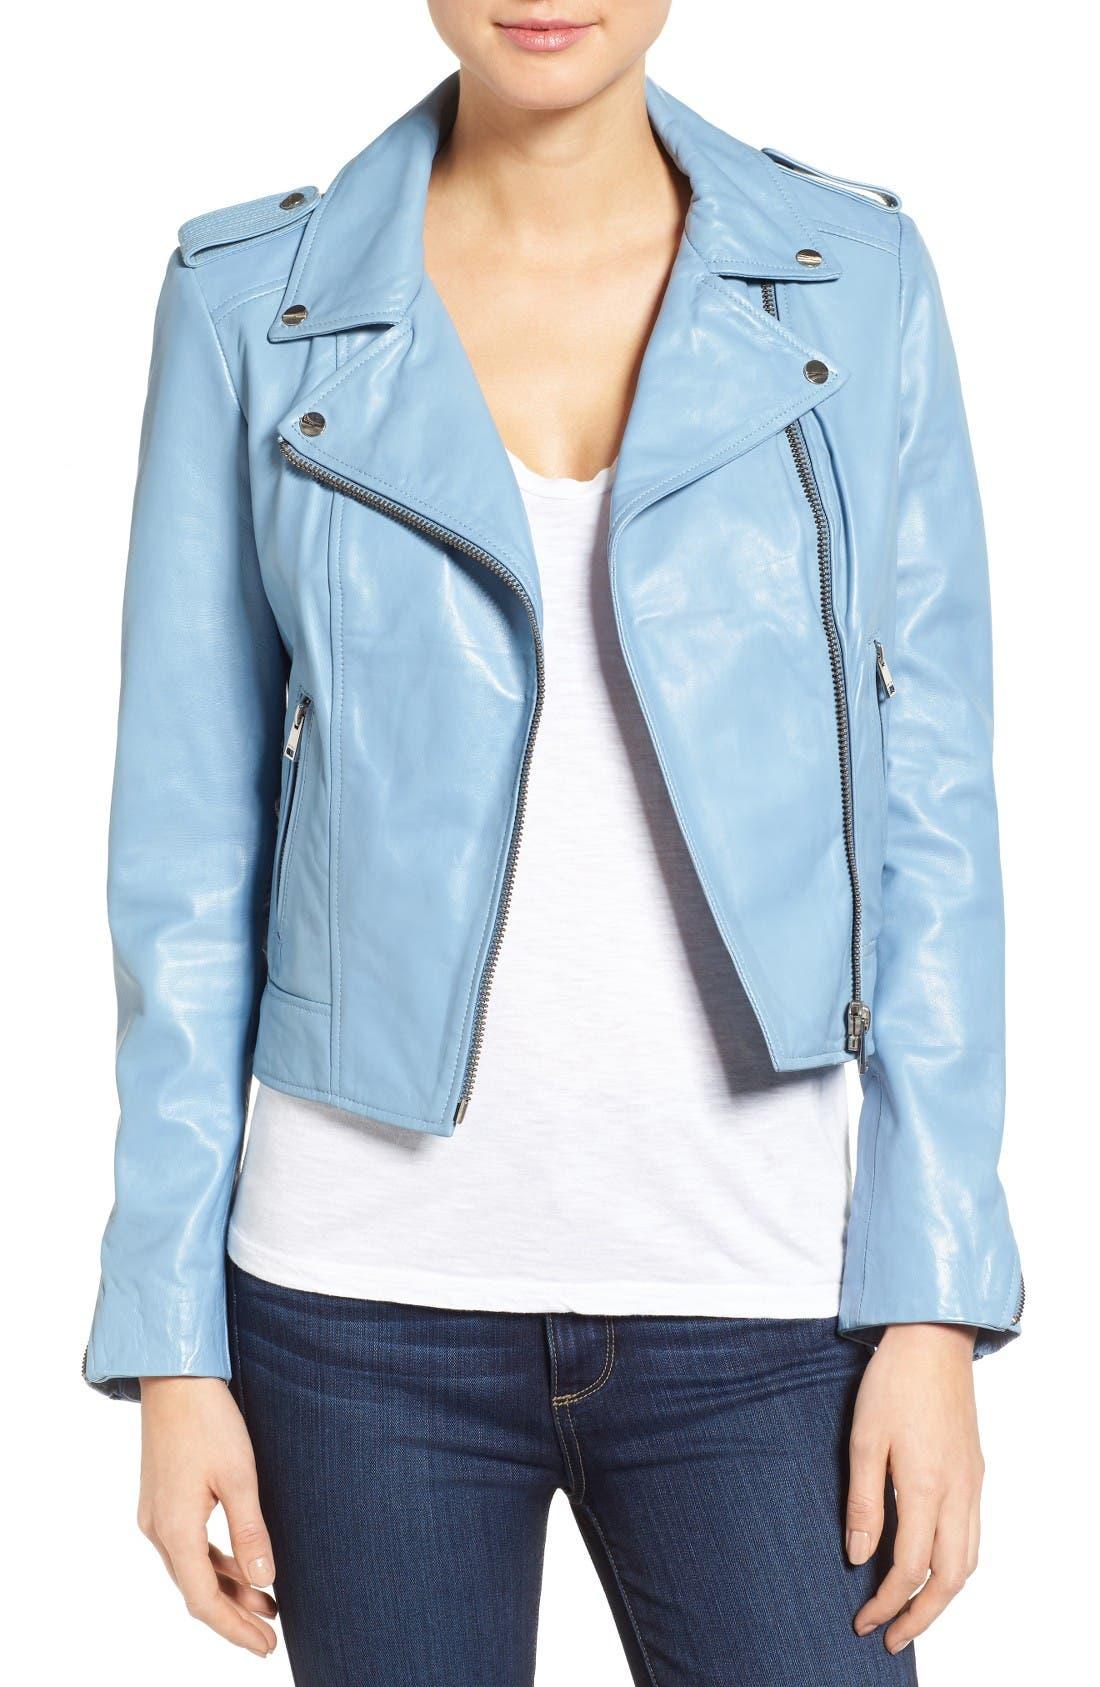 LAMARQUE Donna Lambskin Leather Moto Jacket in Powder Blue